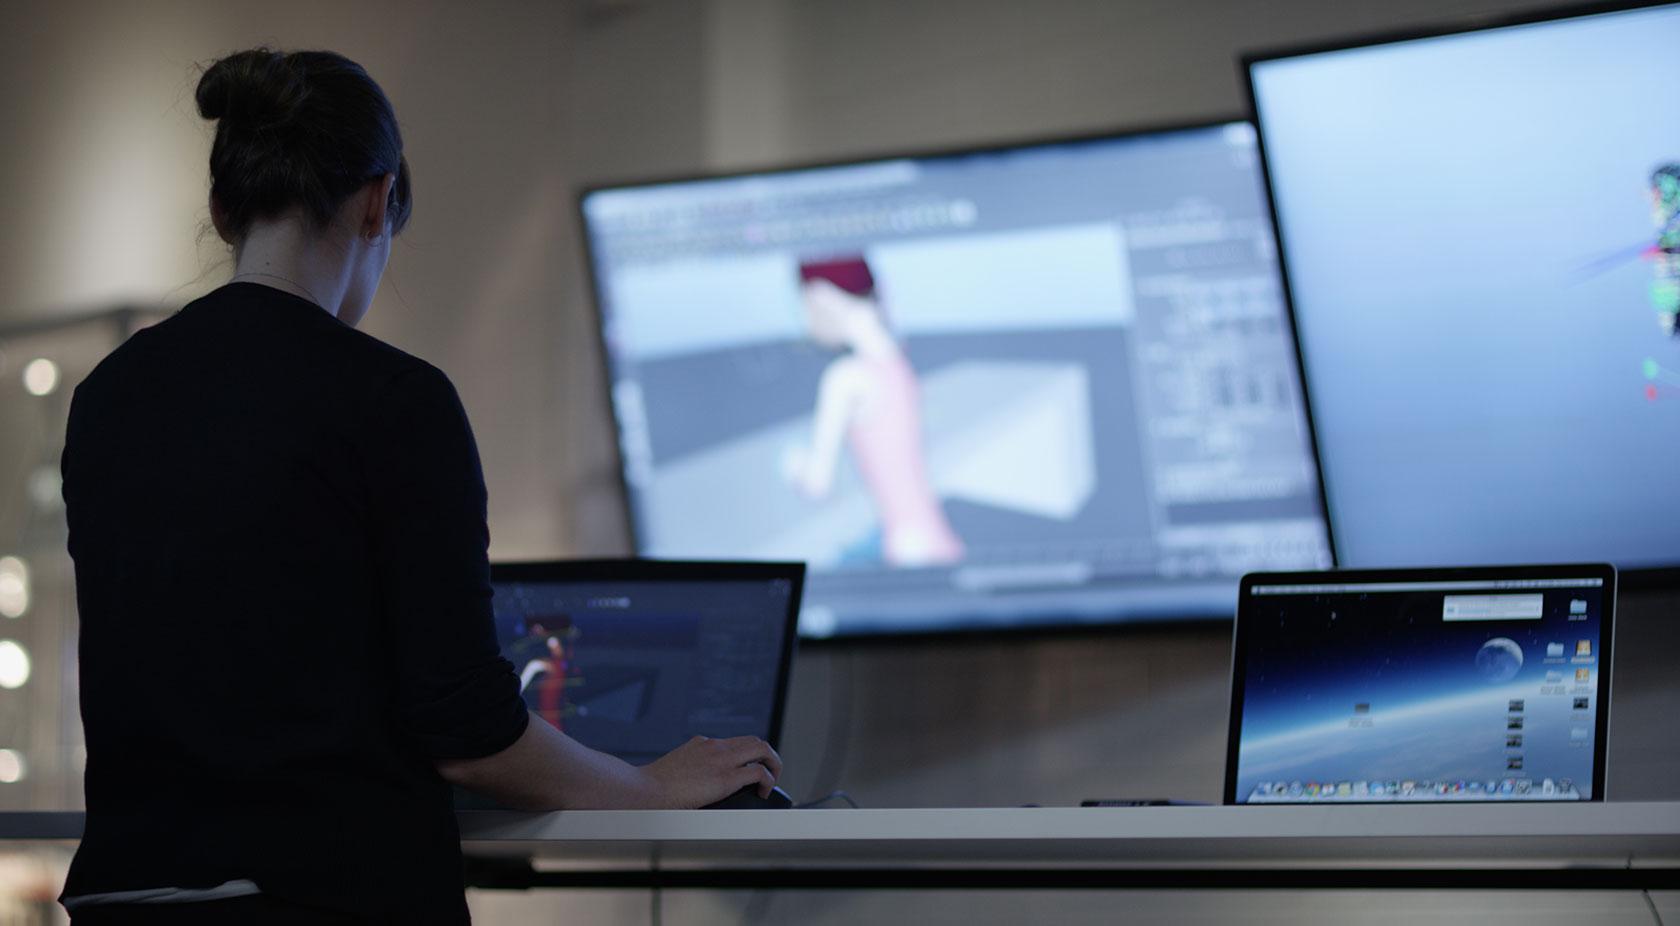 Software | 3D Animation & VFX for Film